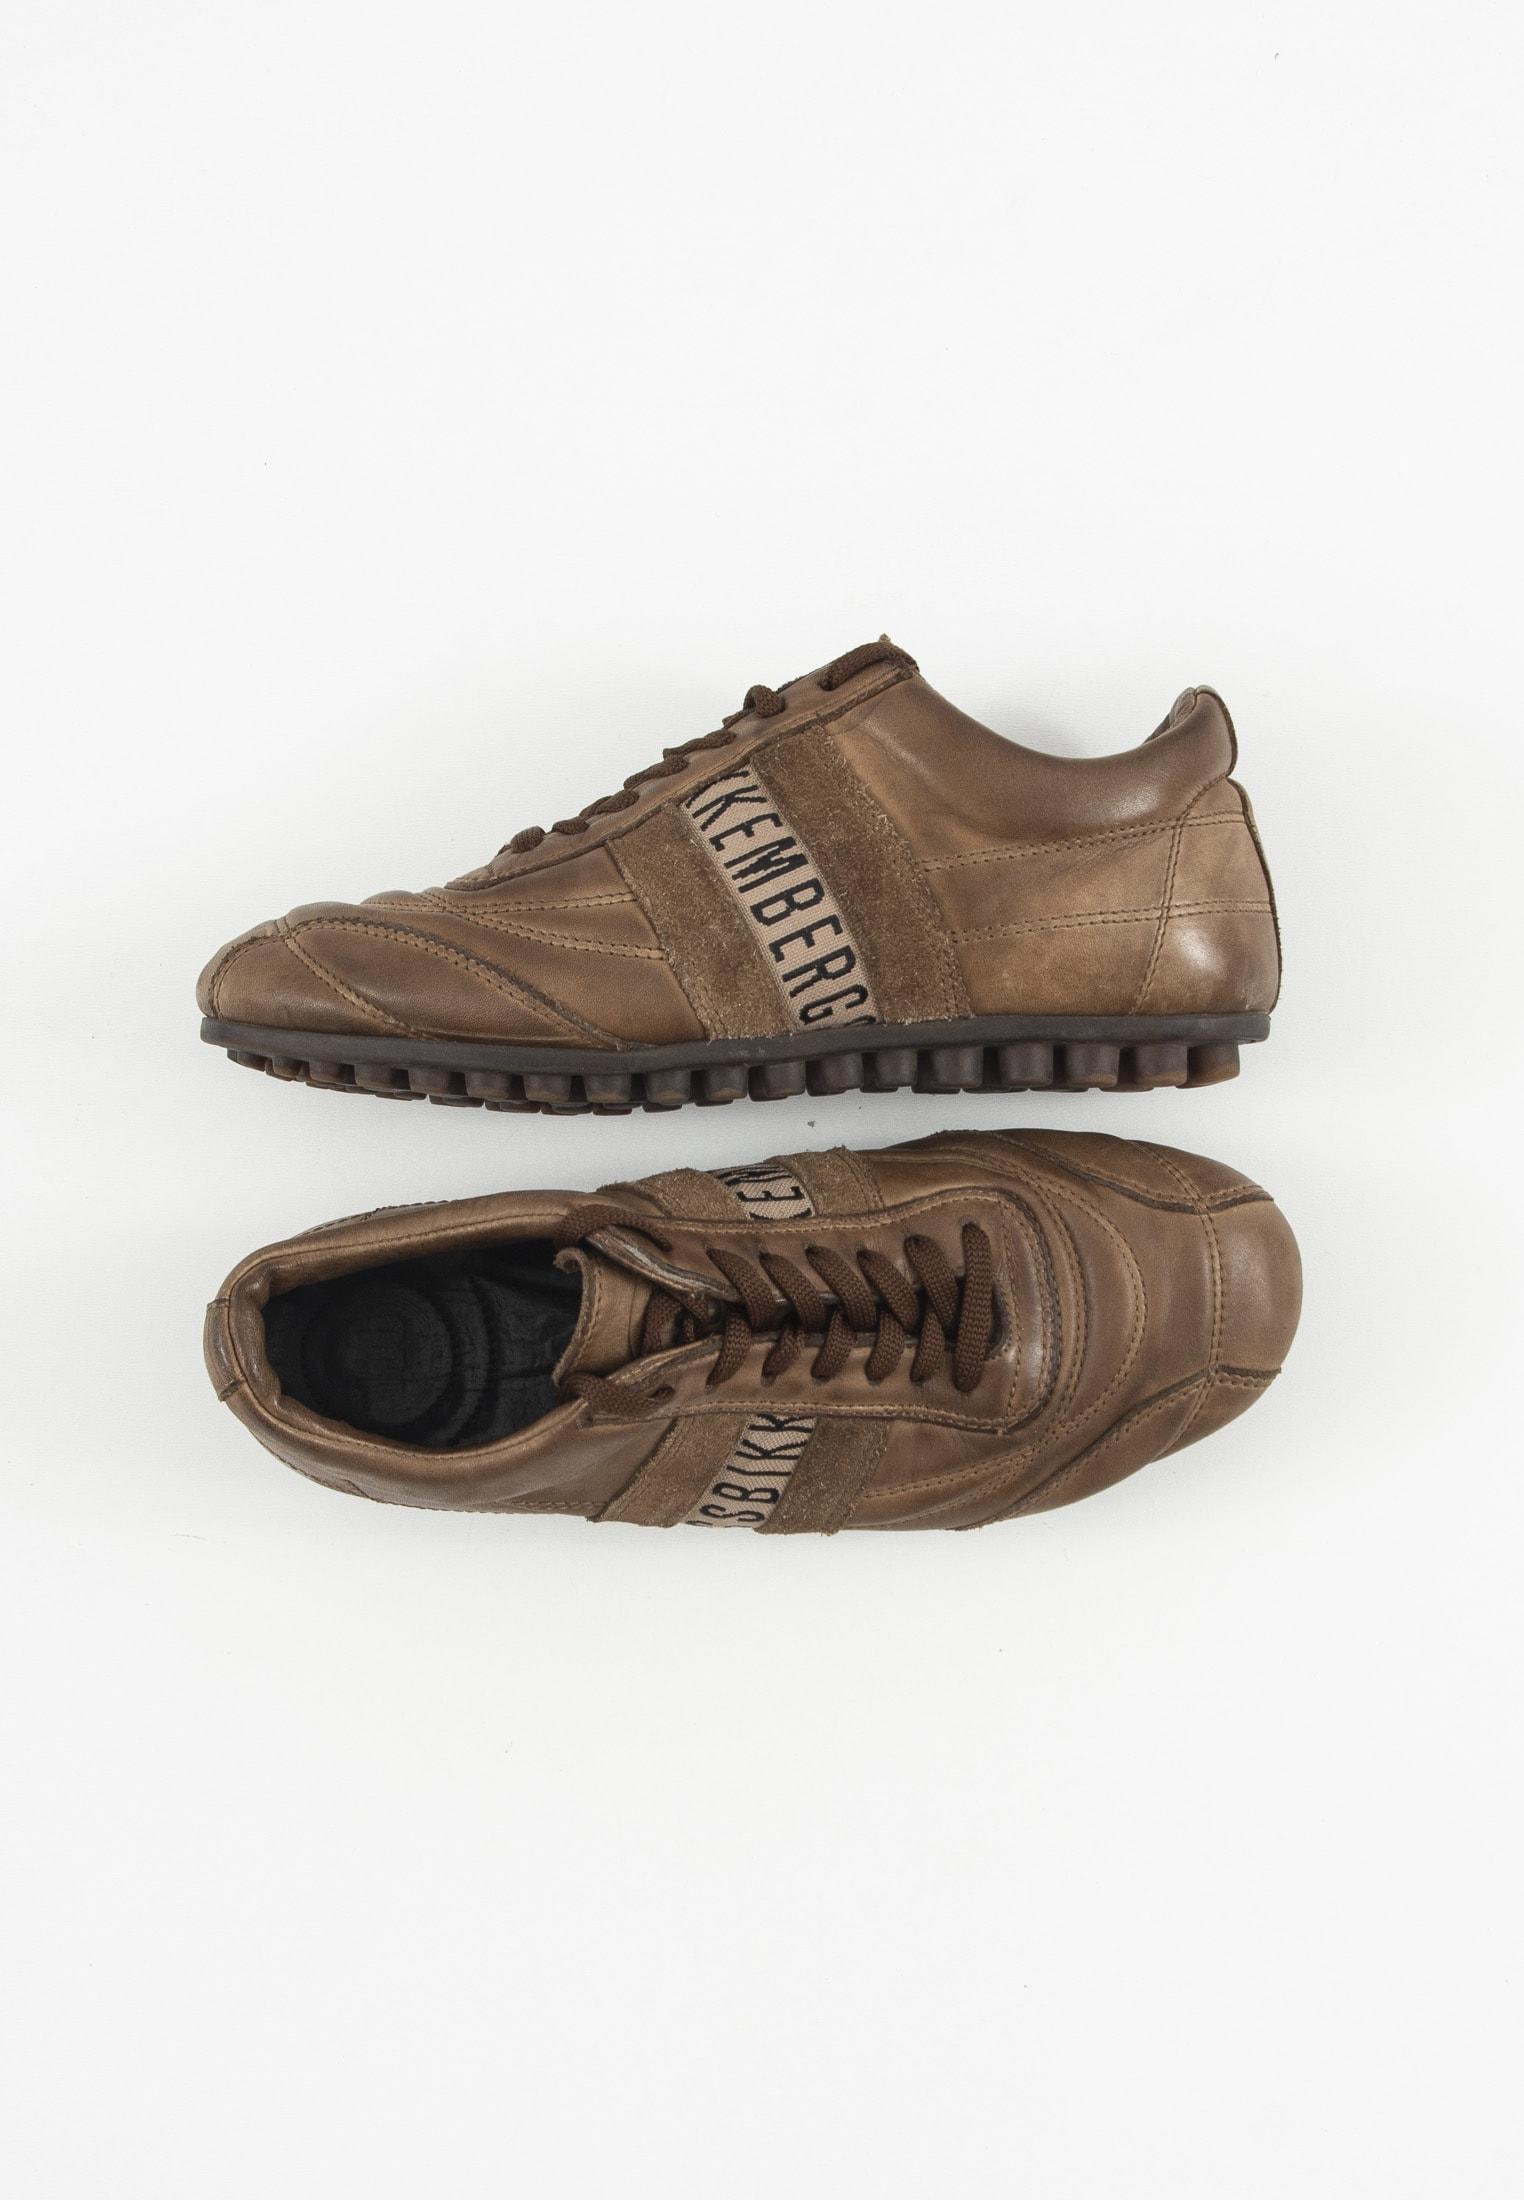 Bikkembergs Sneakers Braun Gr.37